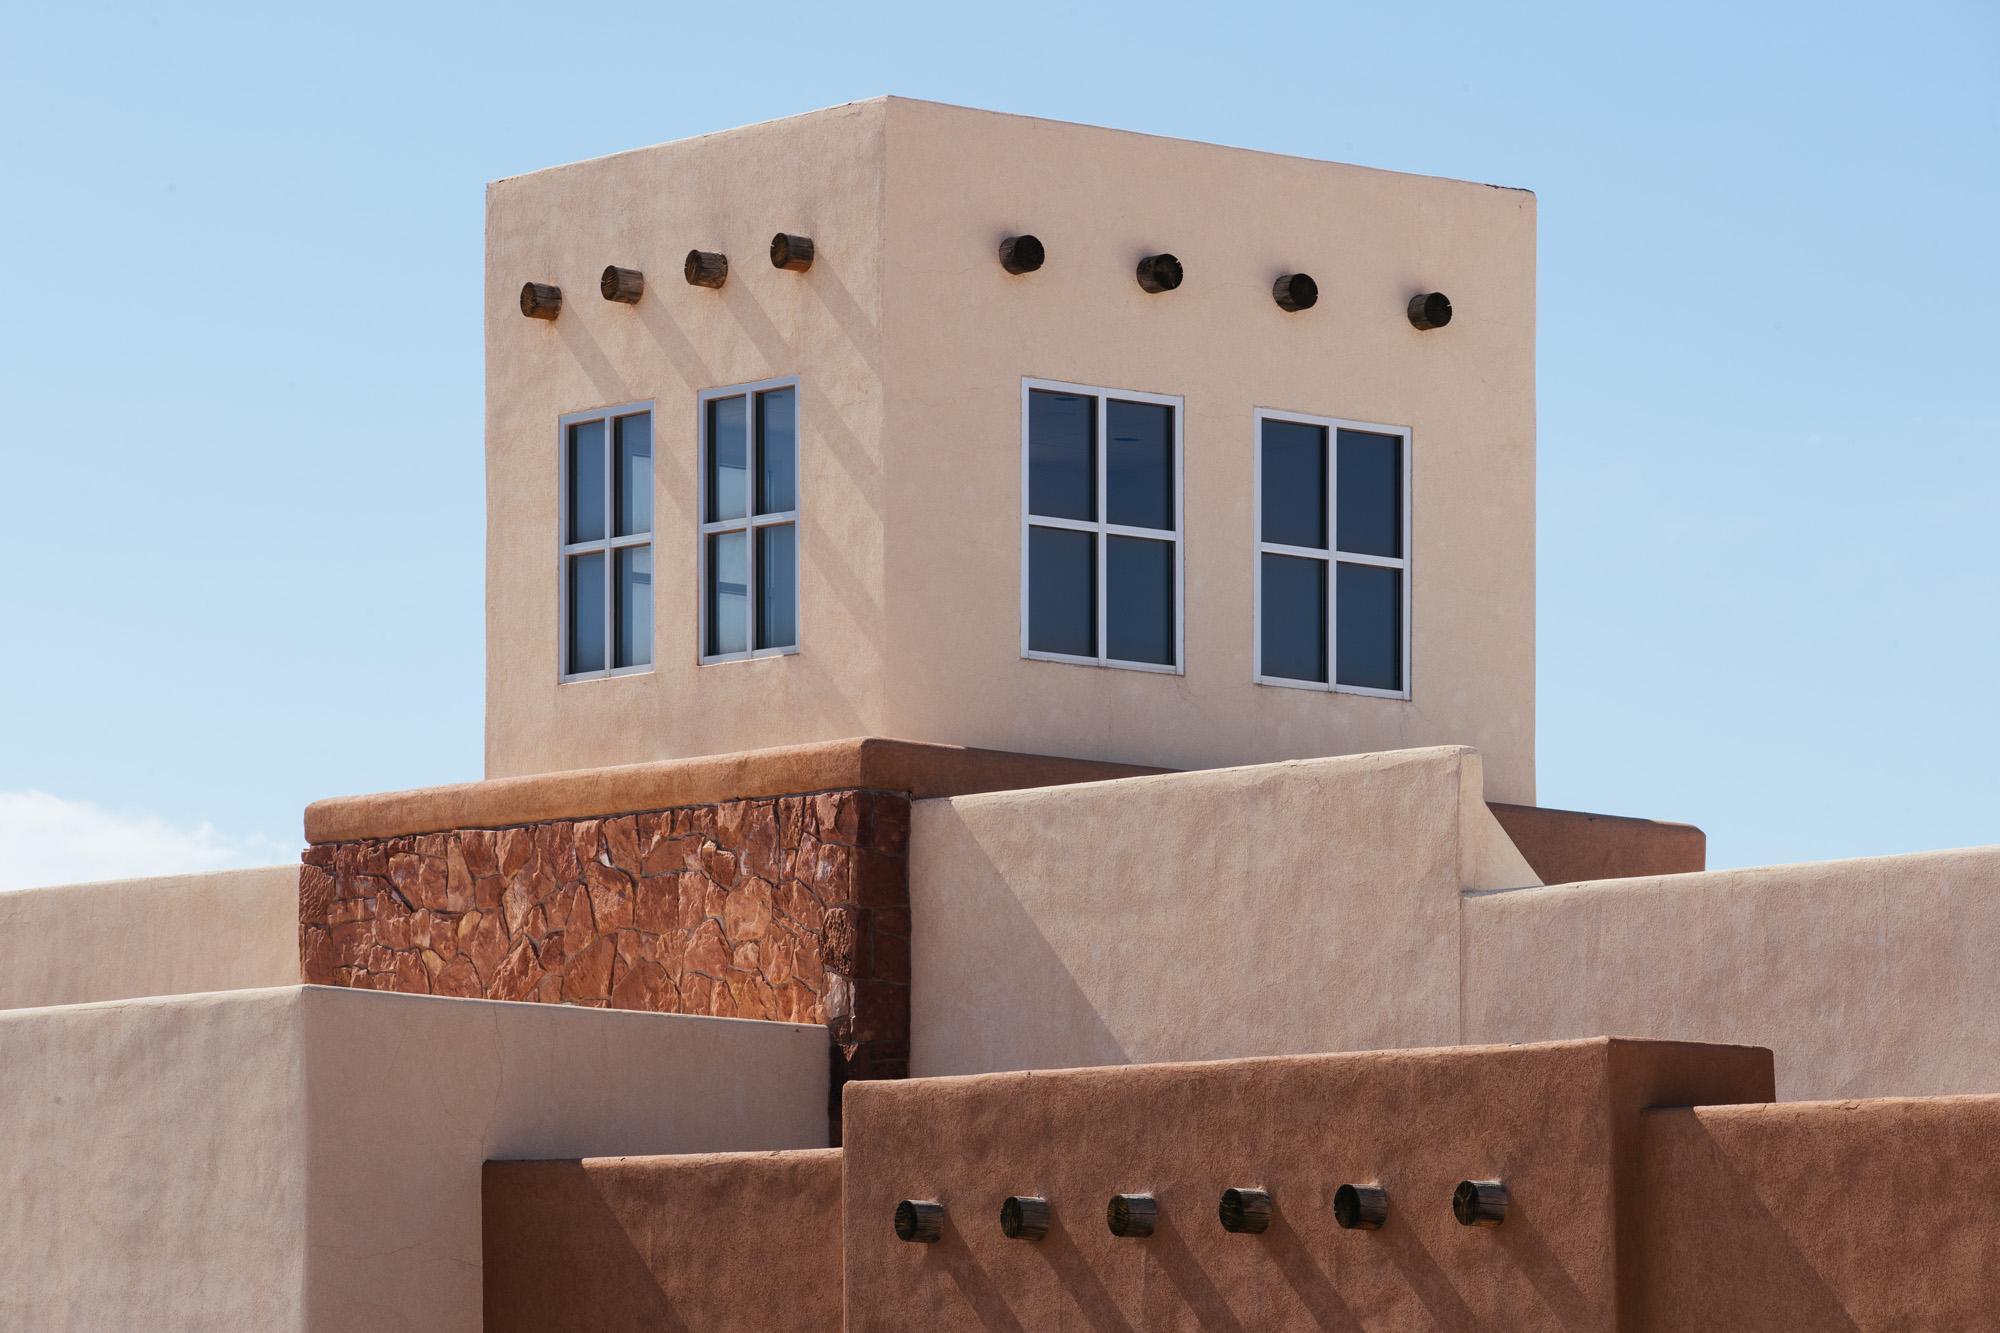 Architectural Moment